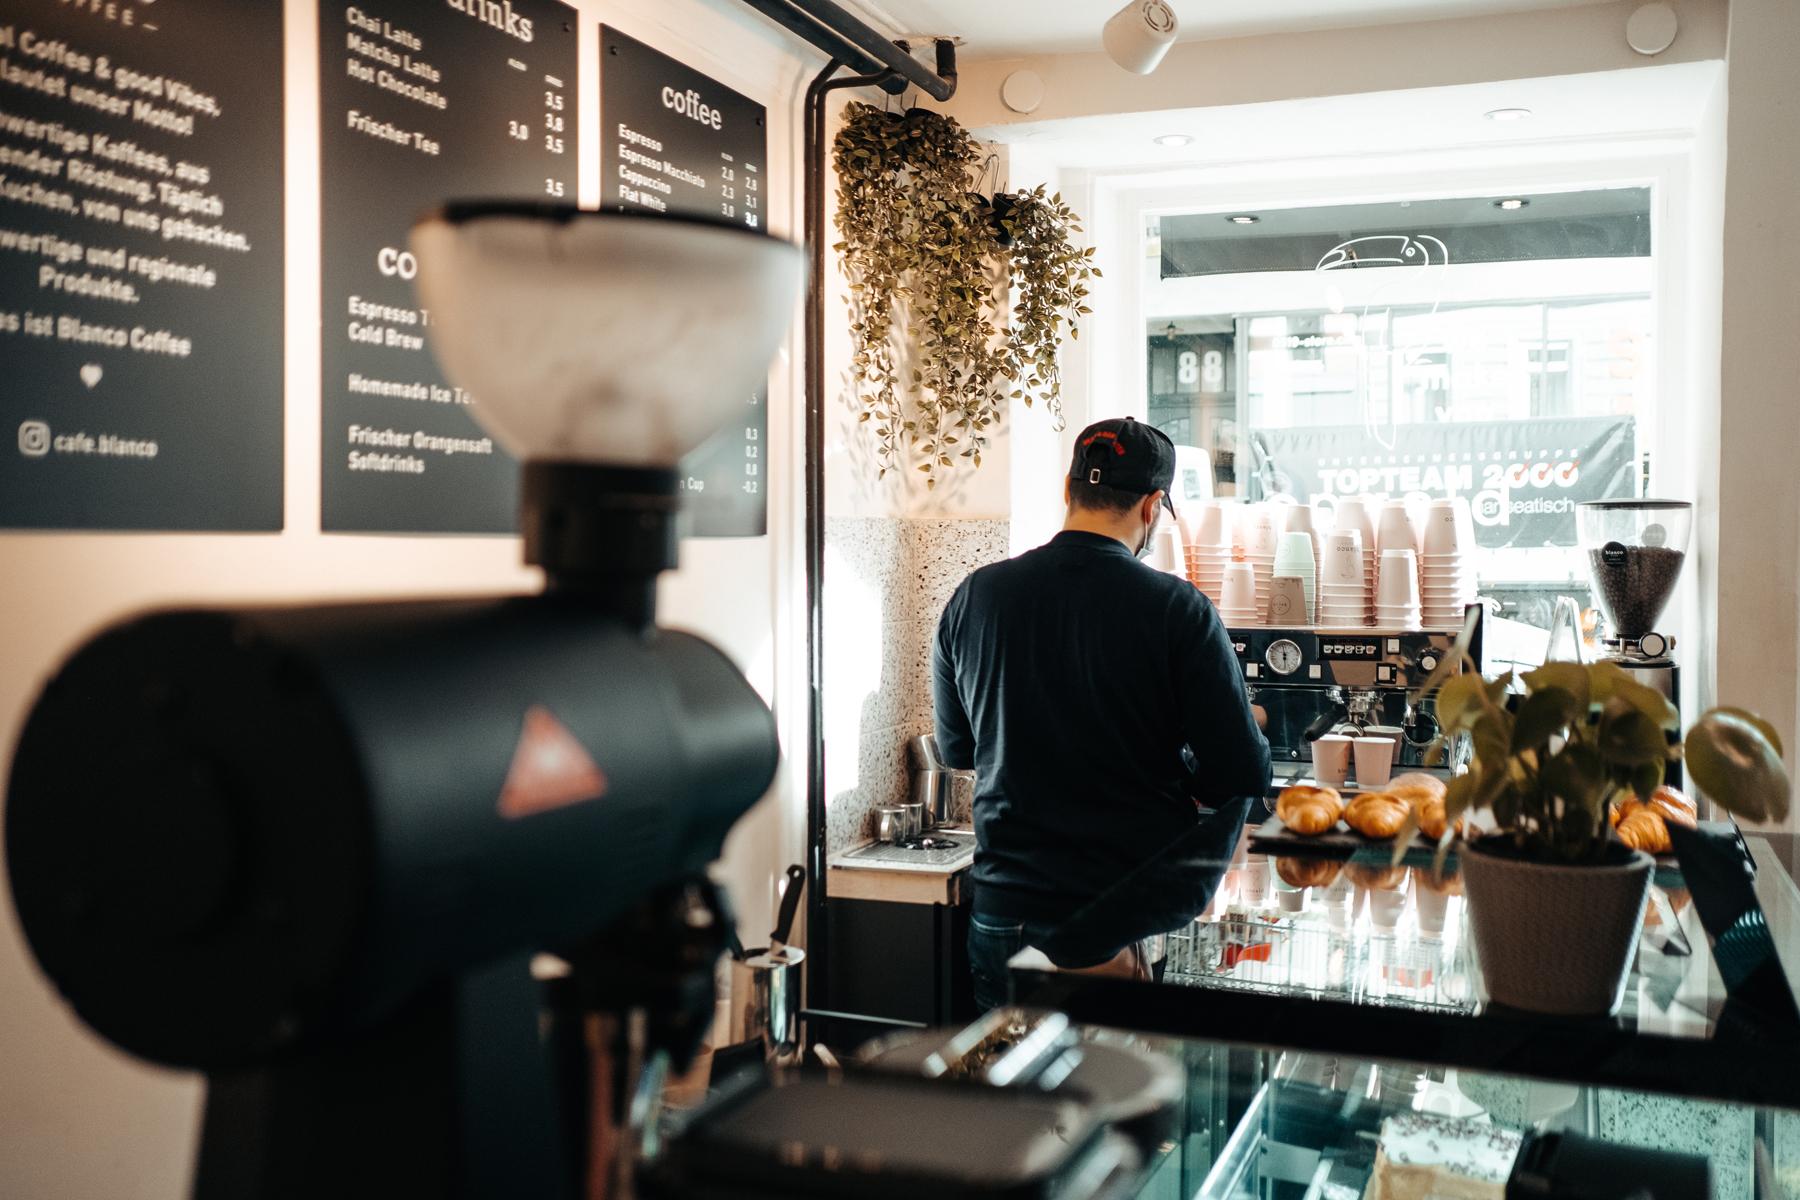 Geheimtipp Hamburg St Georg Café Coffee Blanco Dahlina Sophie Kock 07